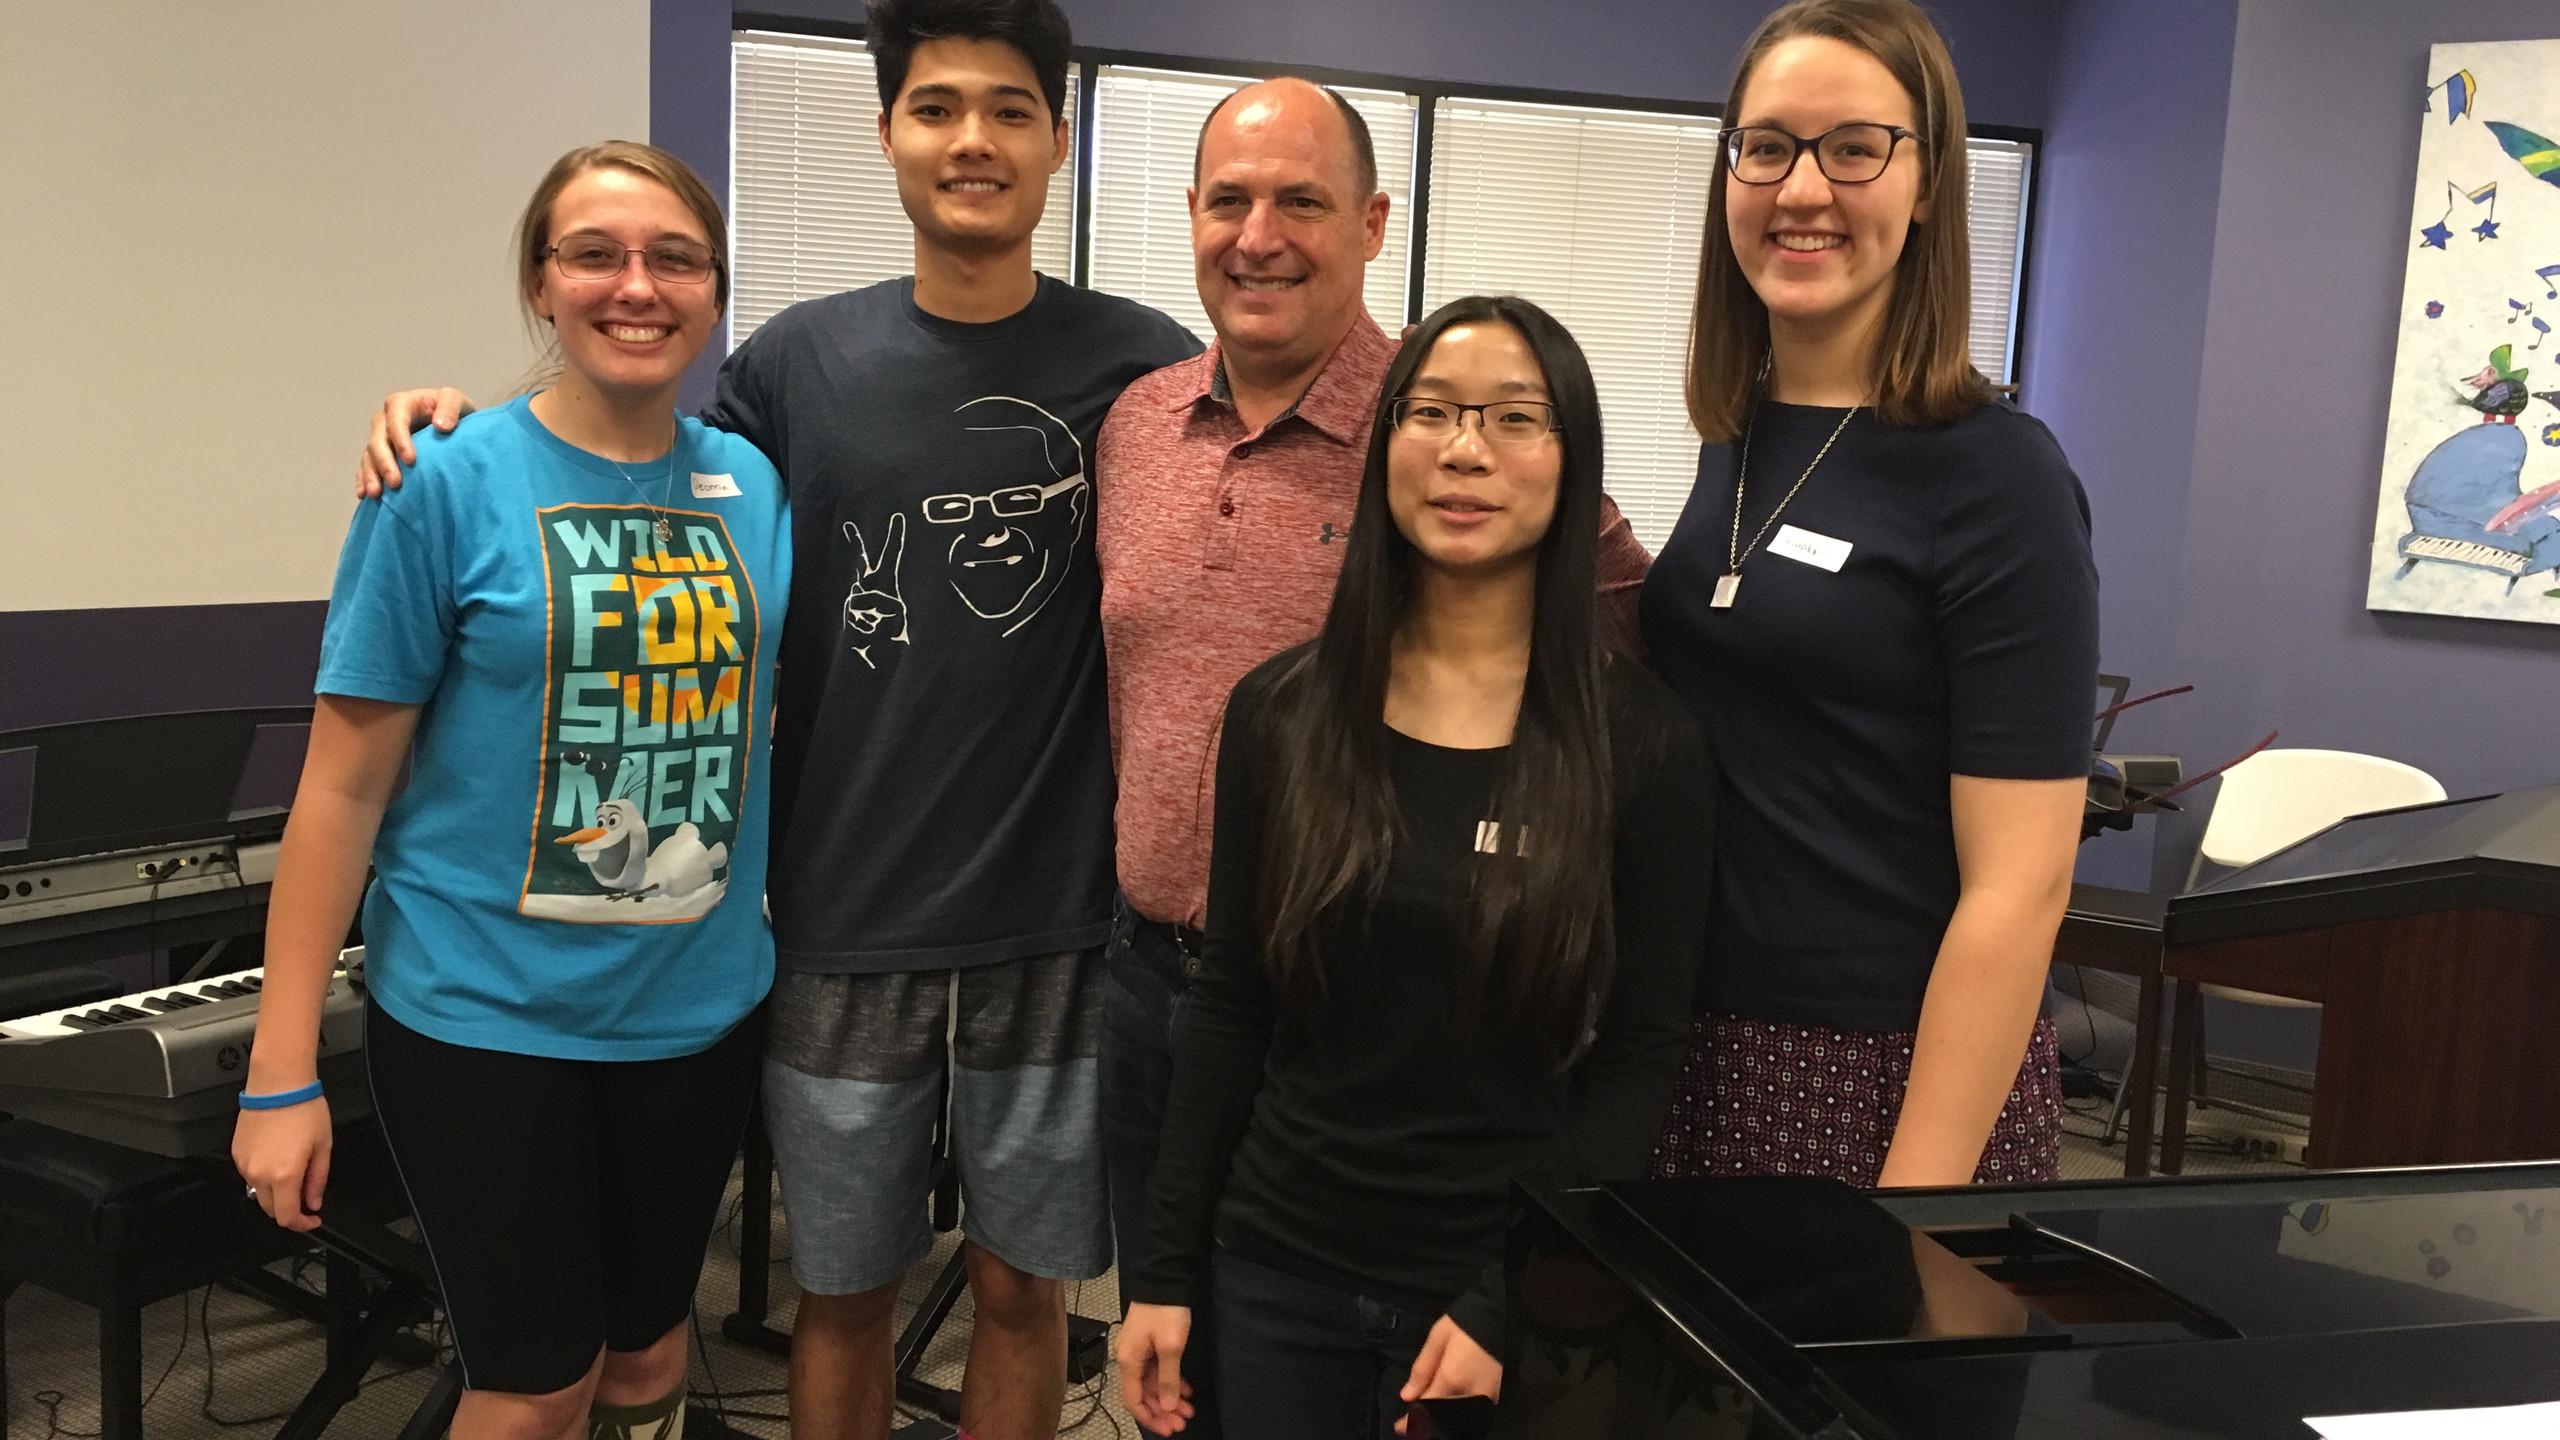 Phillip Keveren Improvisation Camp with students